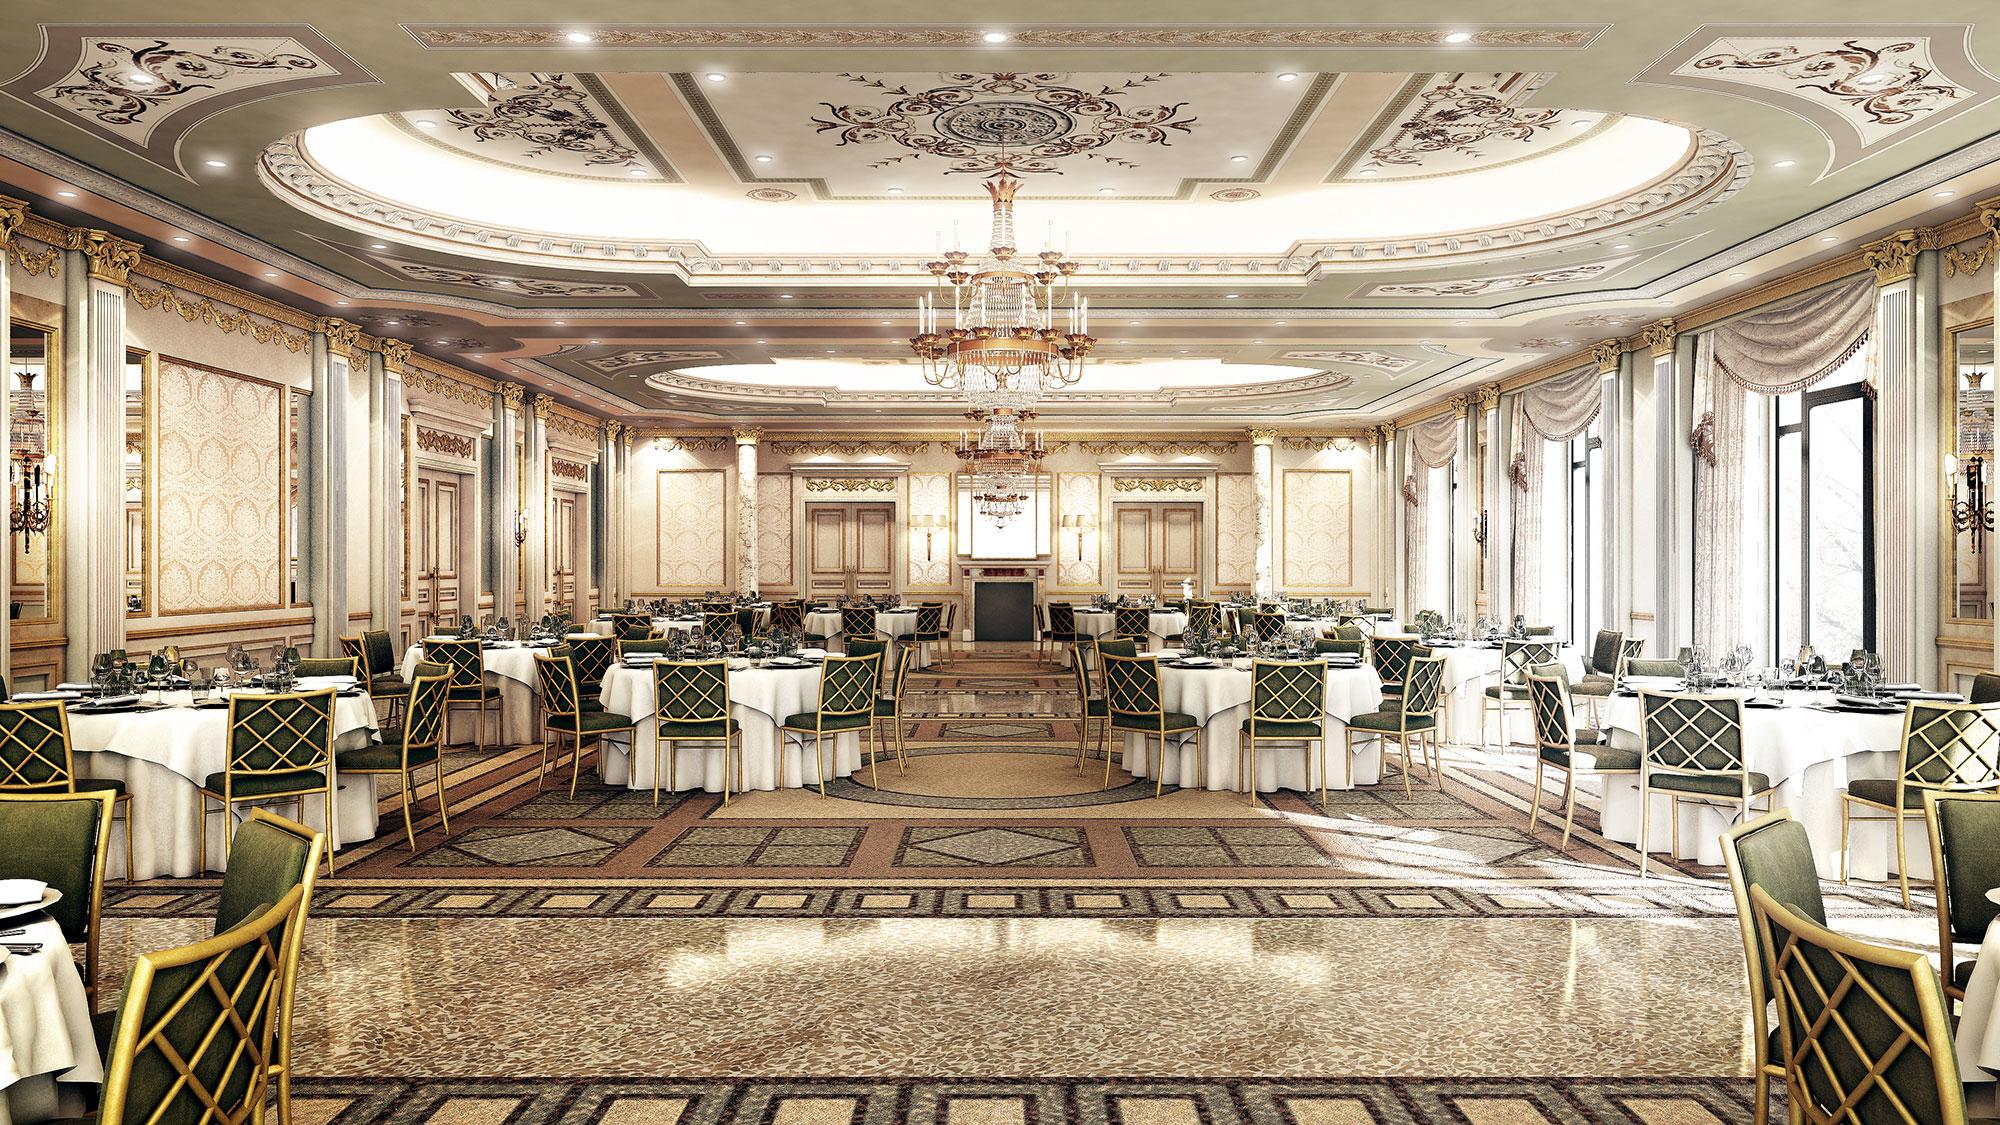 Palazzo Ballroom